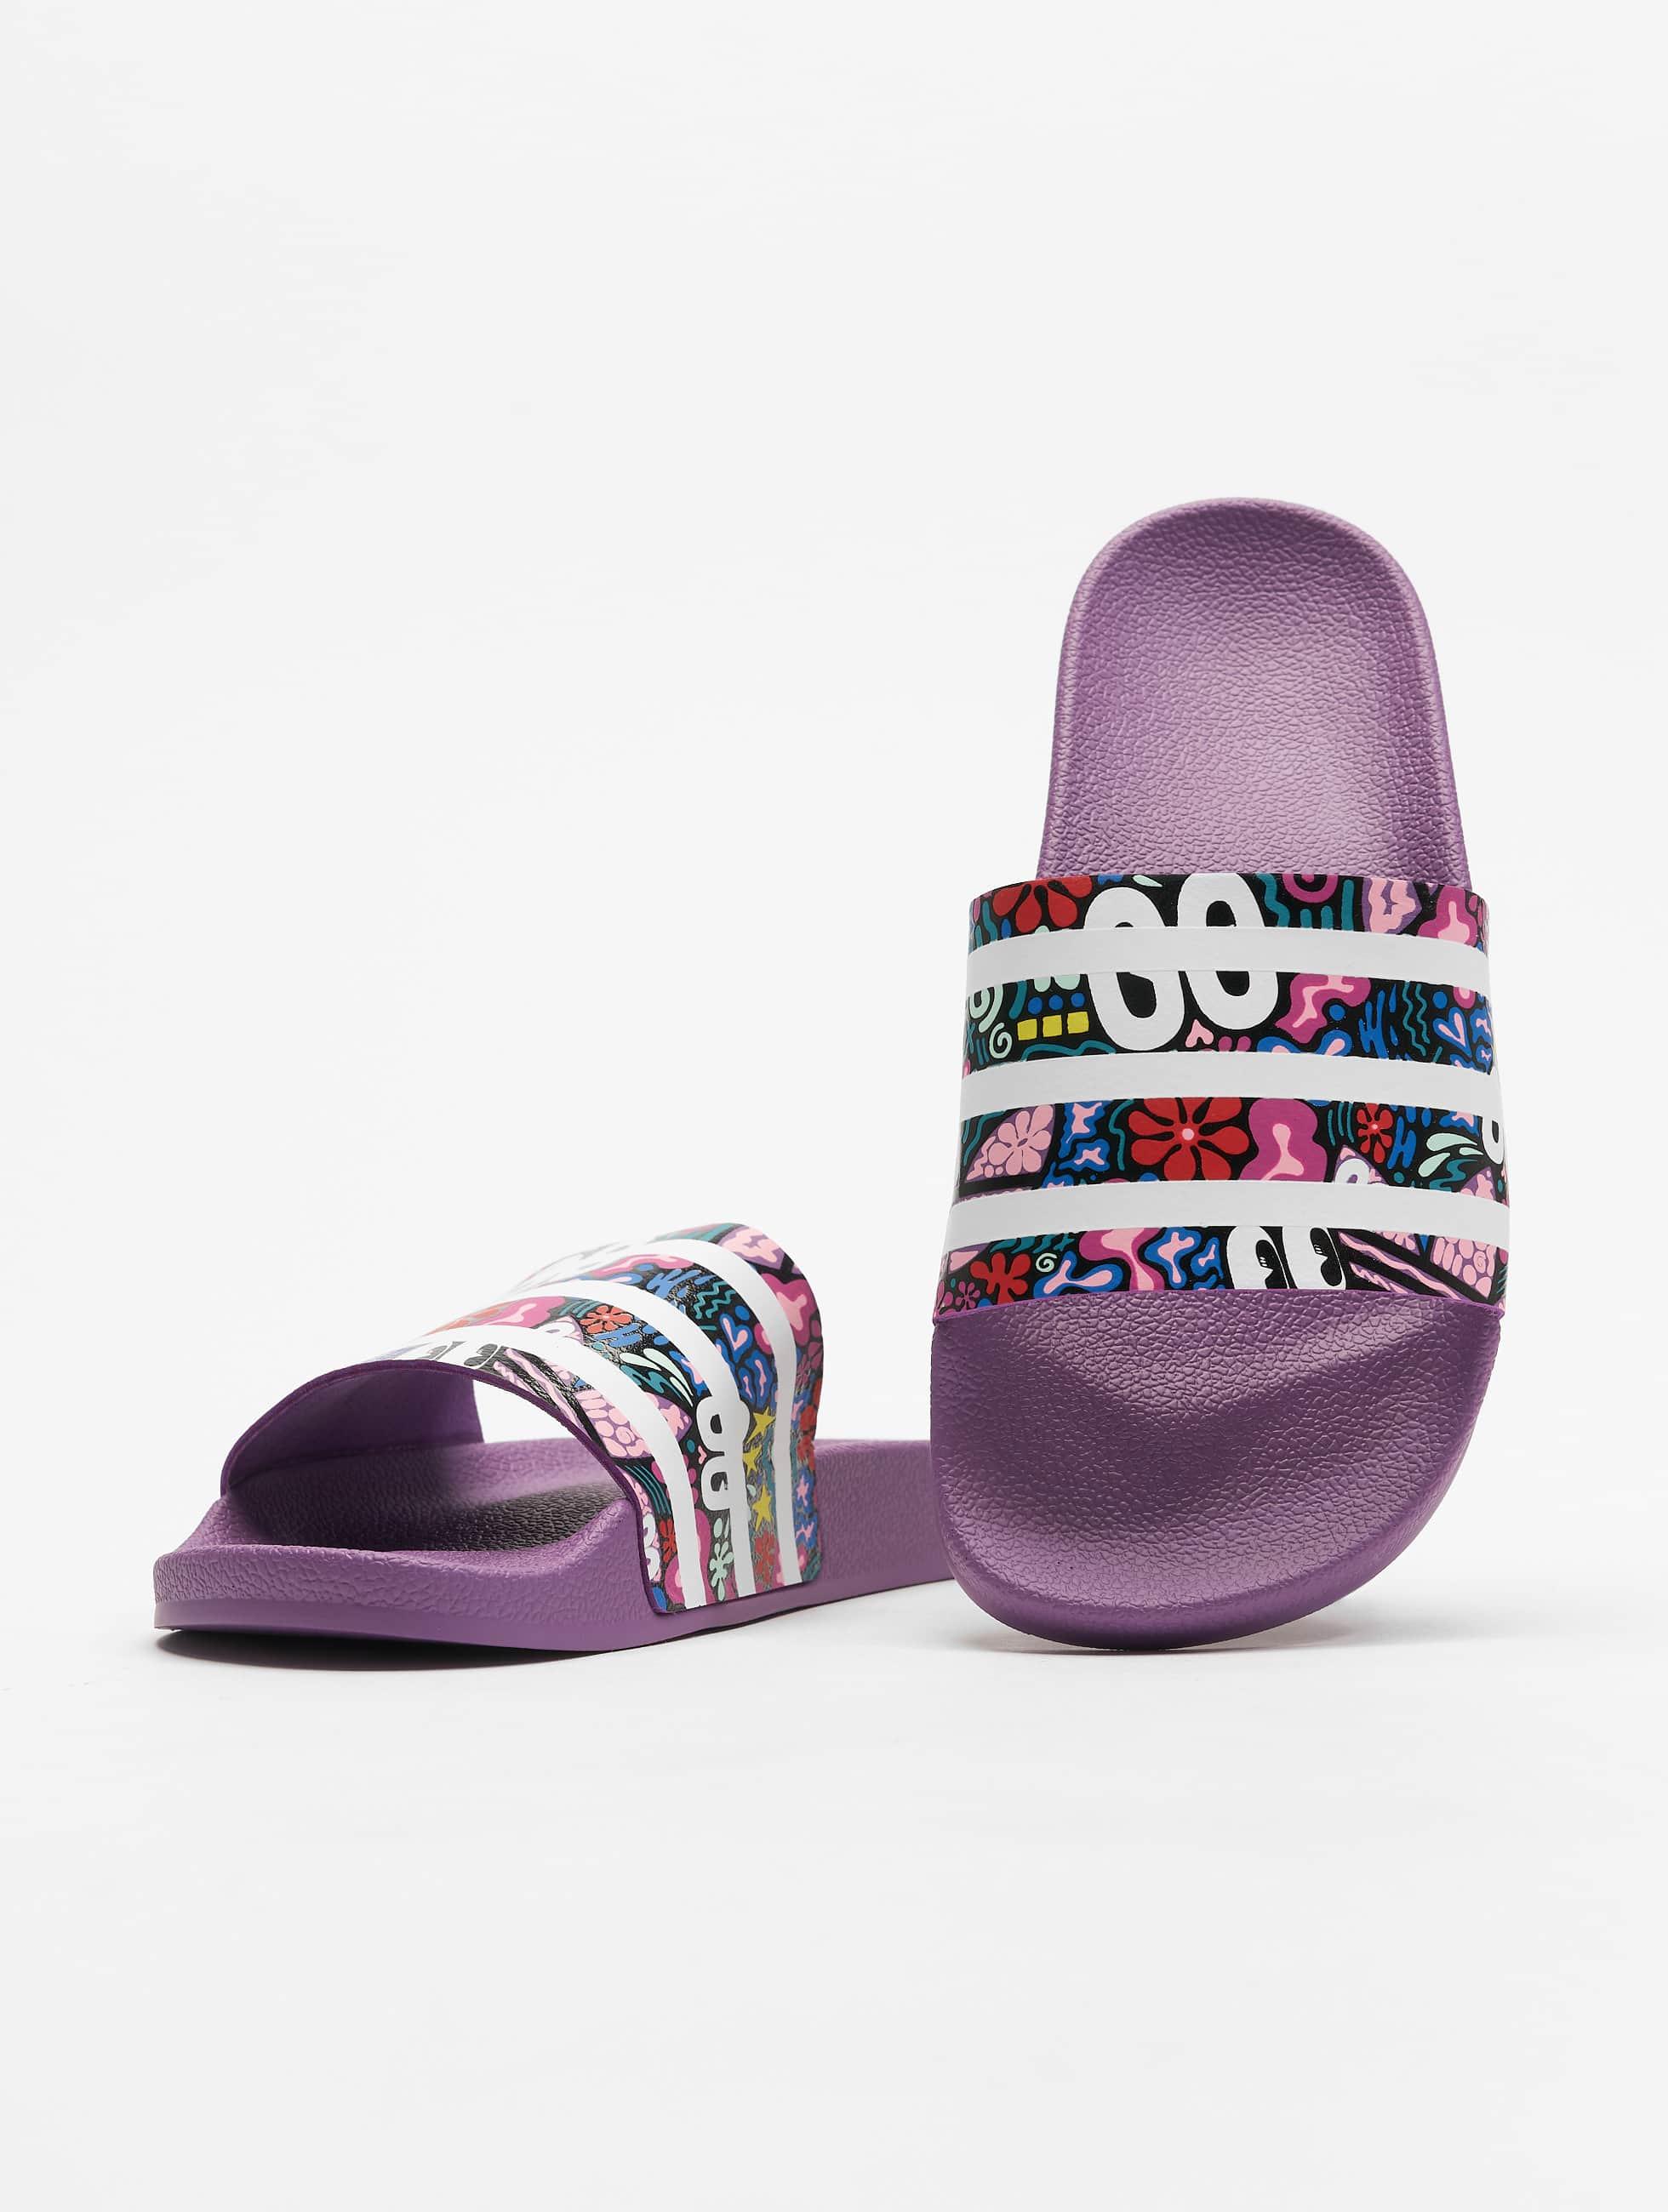 49371c99a1a adidas originals schoen / Slipper/Sandaal Adilette in paars 599762